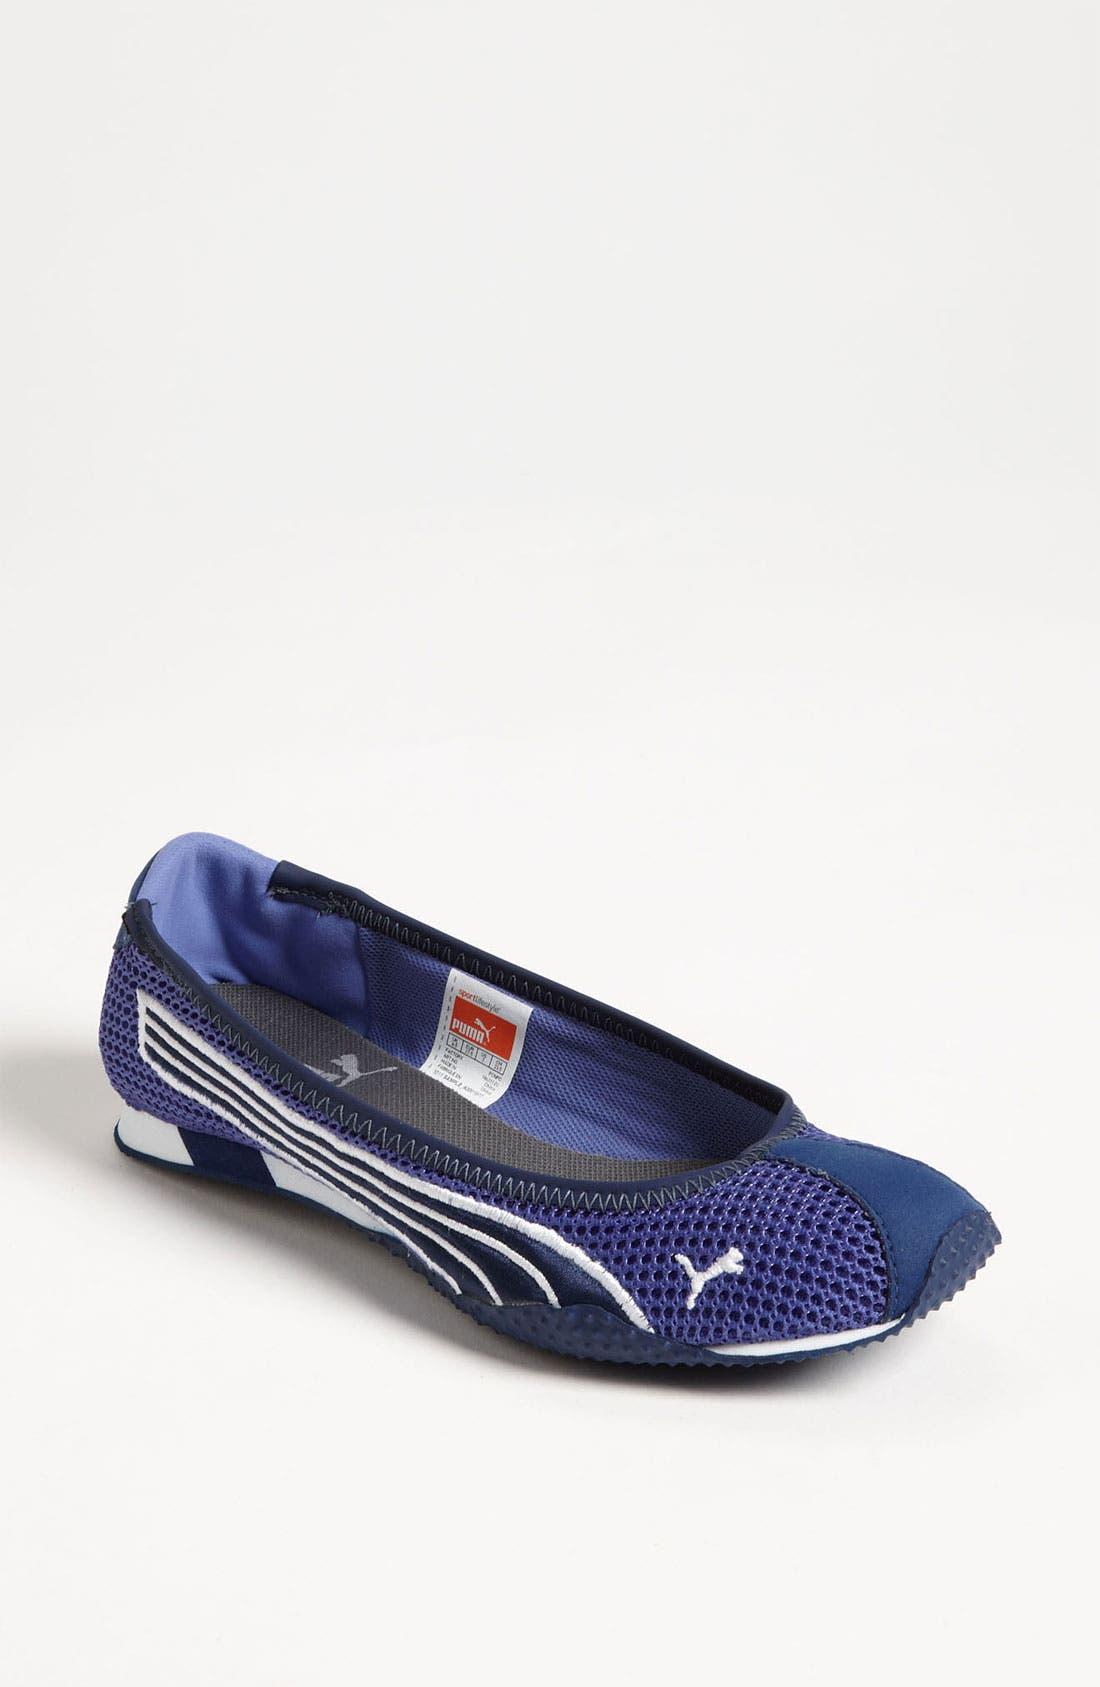 Main Image - Puma 'H Street' Athletic Shoe (Women)